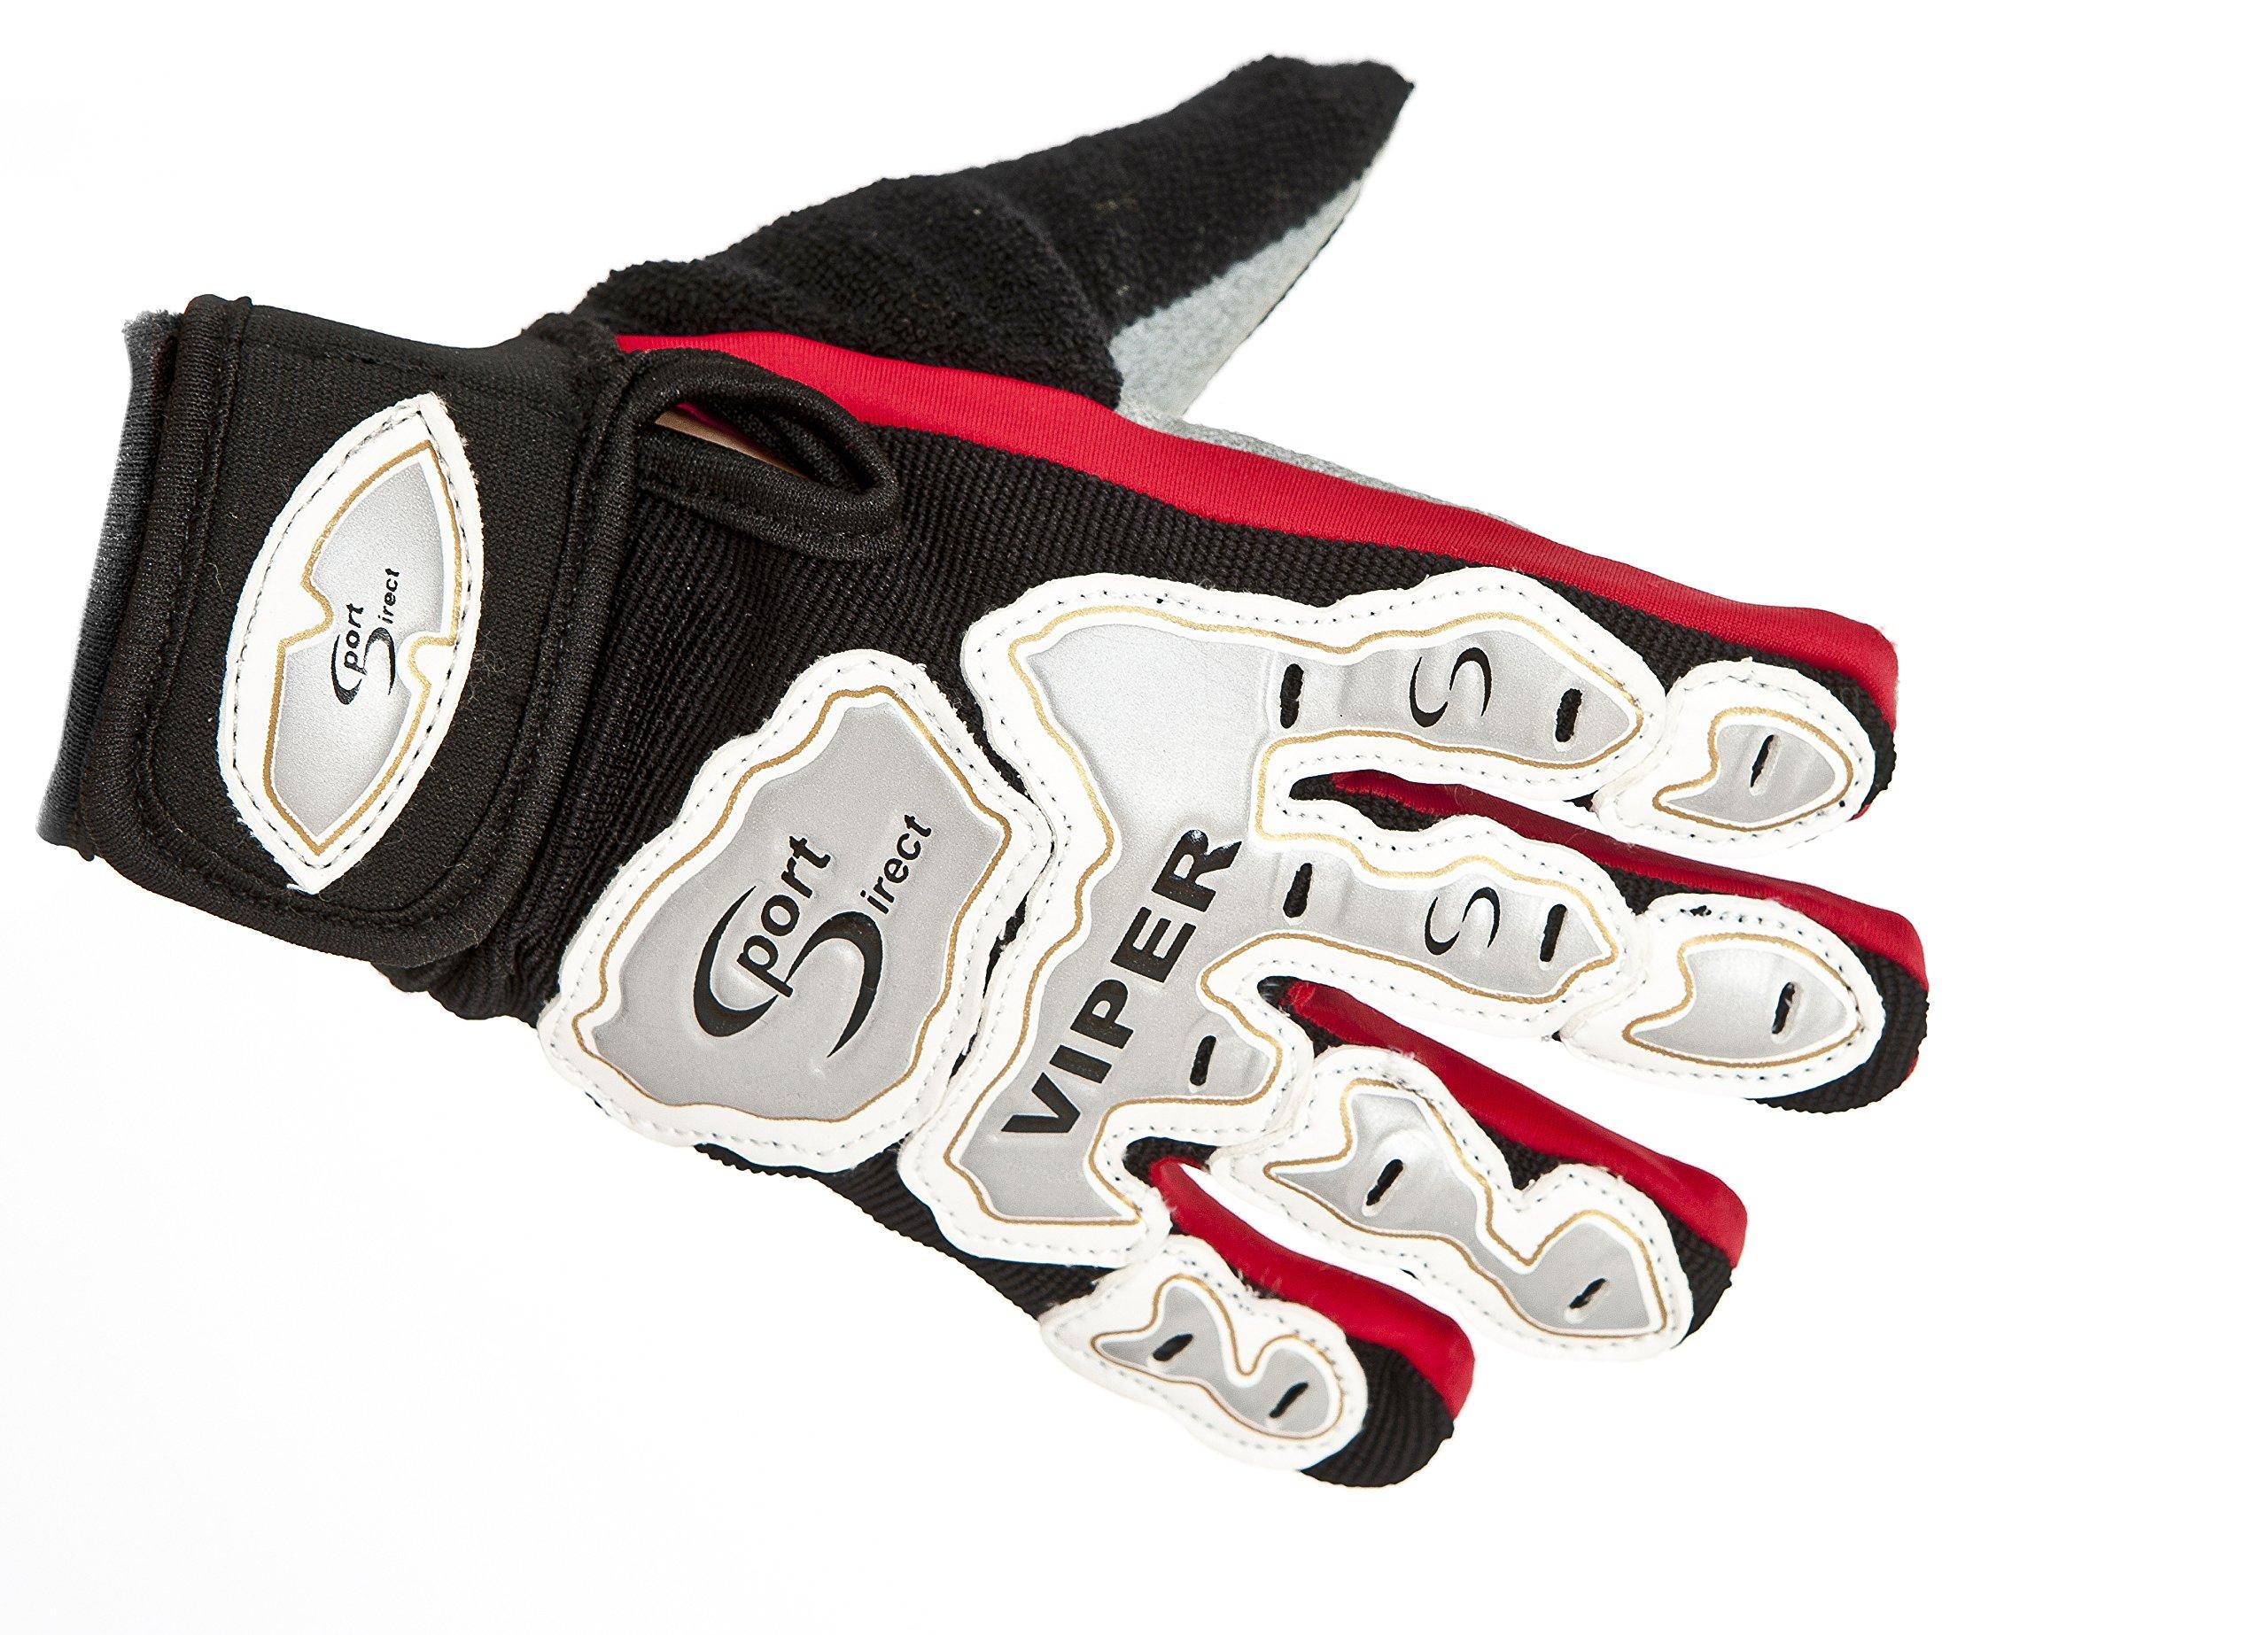 Junior Bmx Viper Bike Gloves by Sport DirectTM (Image #5)